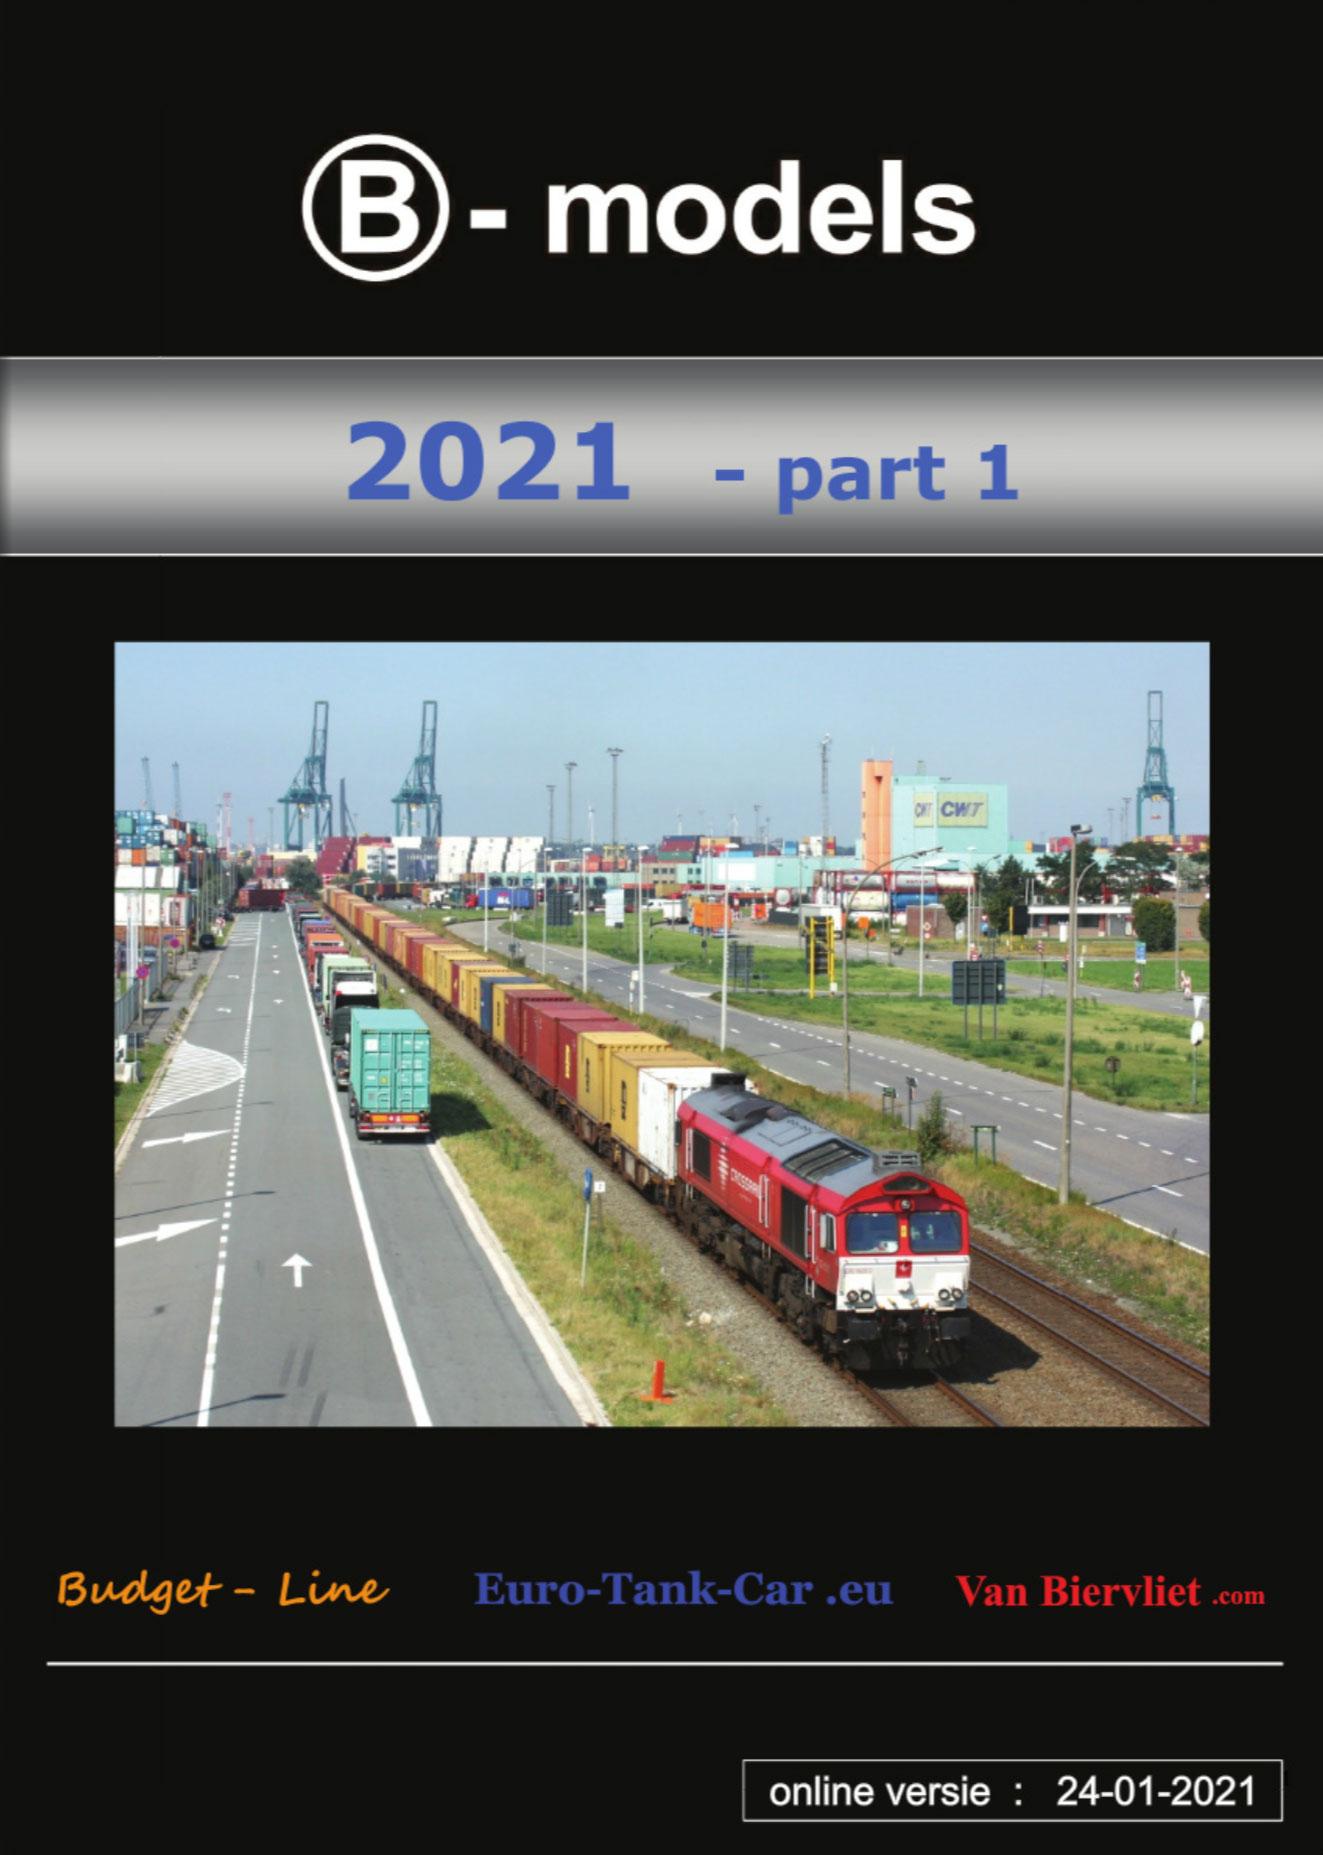 B-models - Catalog 2021 - Freight wagons